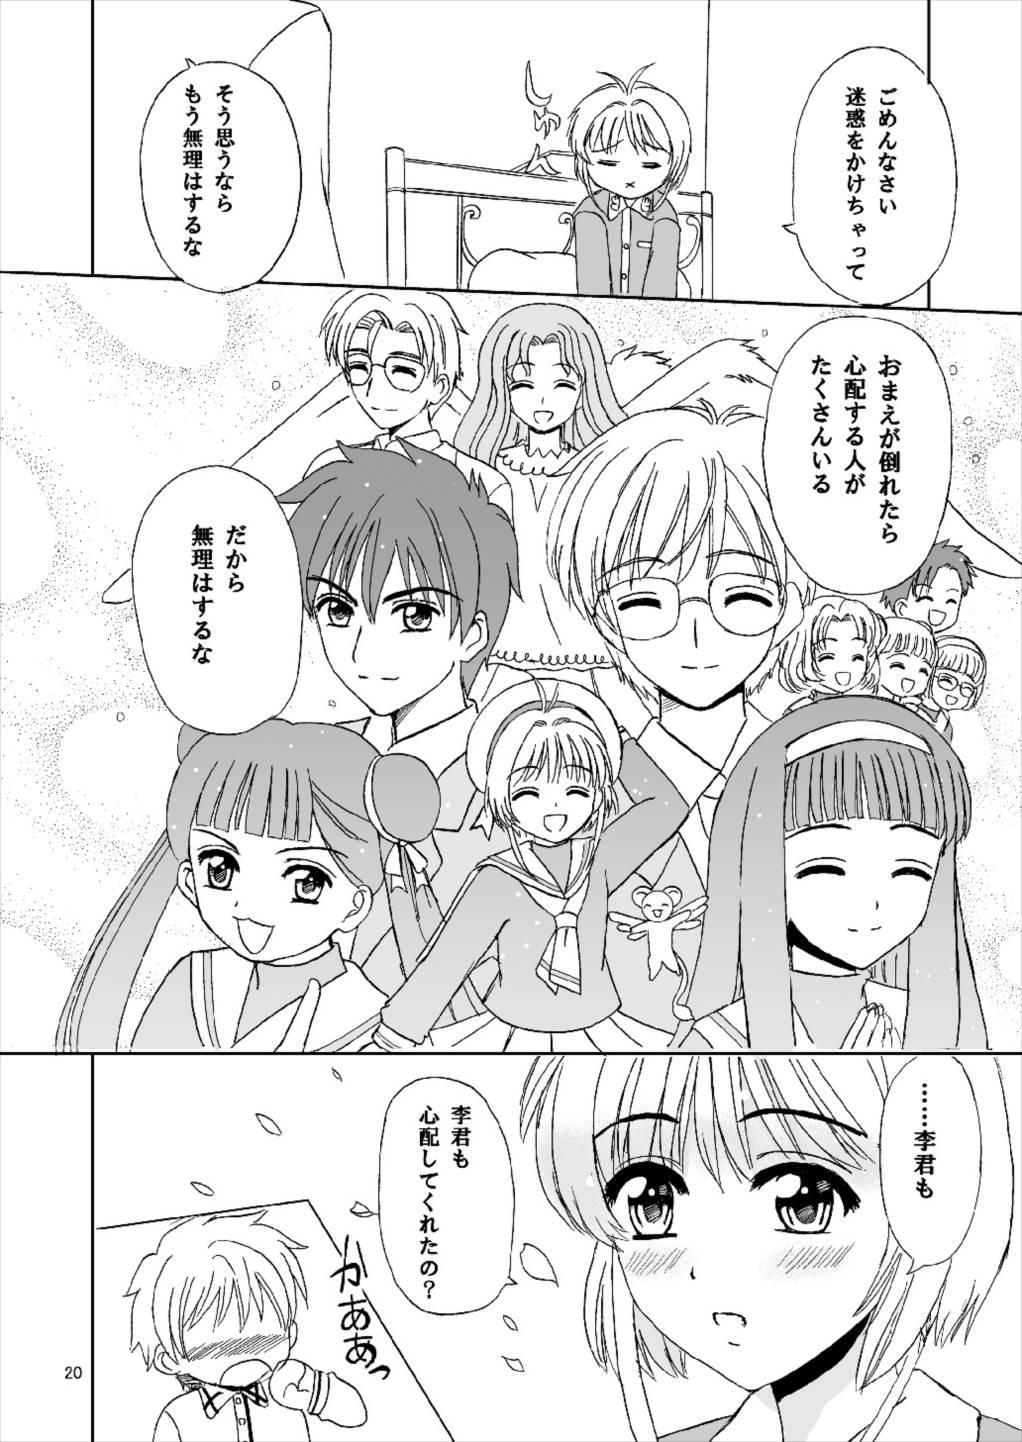 Sakura to Issho! 19